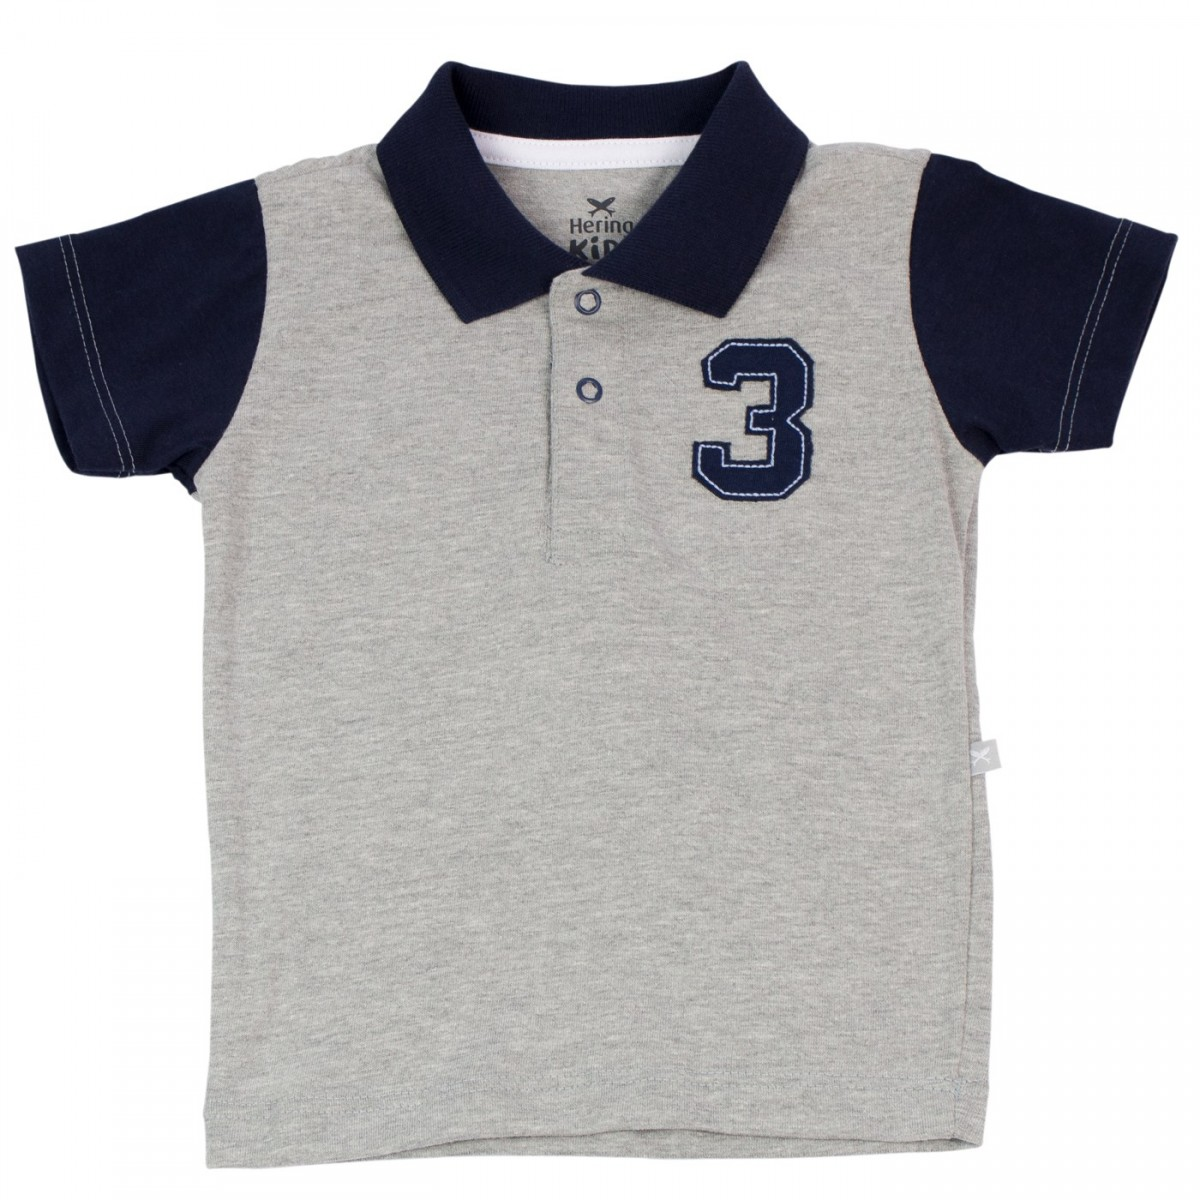 5cbef7f06732d Bizz Store - Camisa Polo Infantil Bebê Menino Manga Curta Cinza